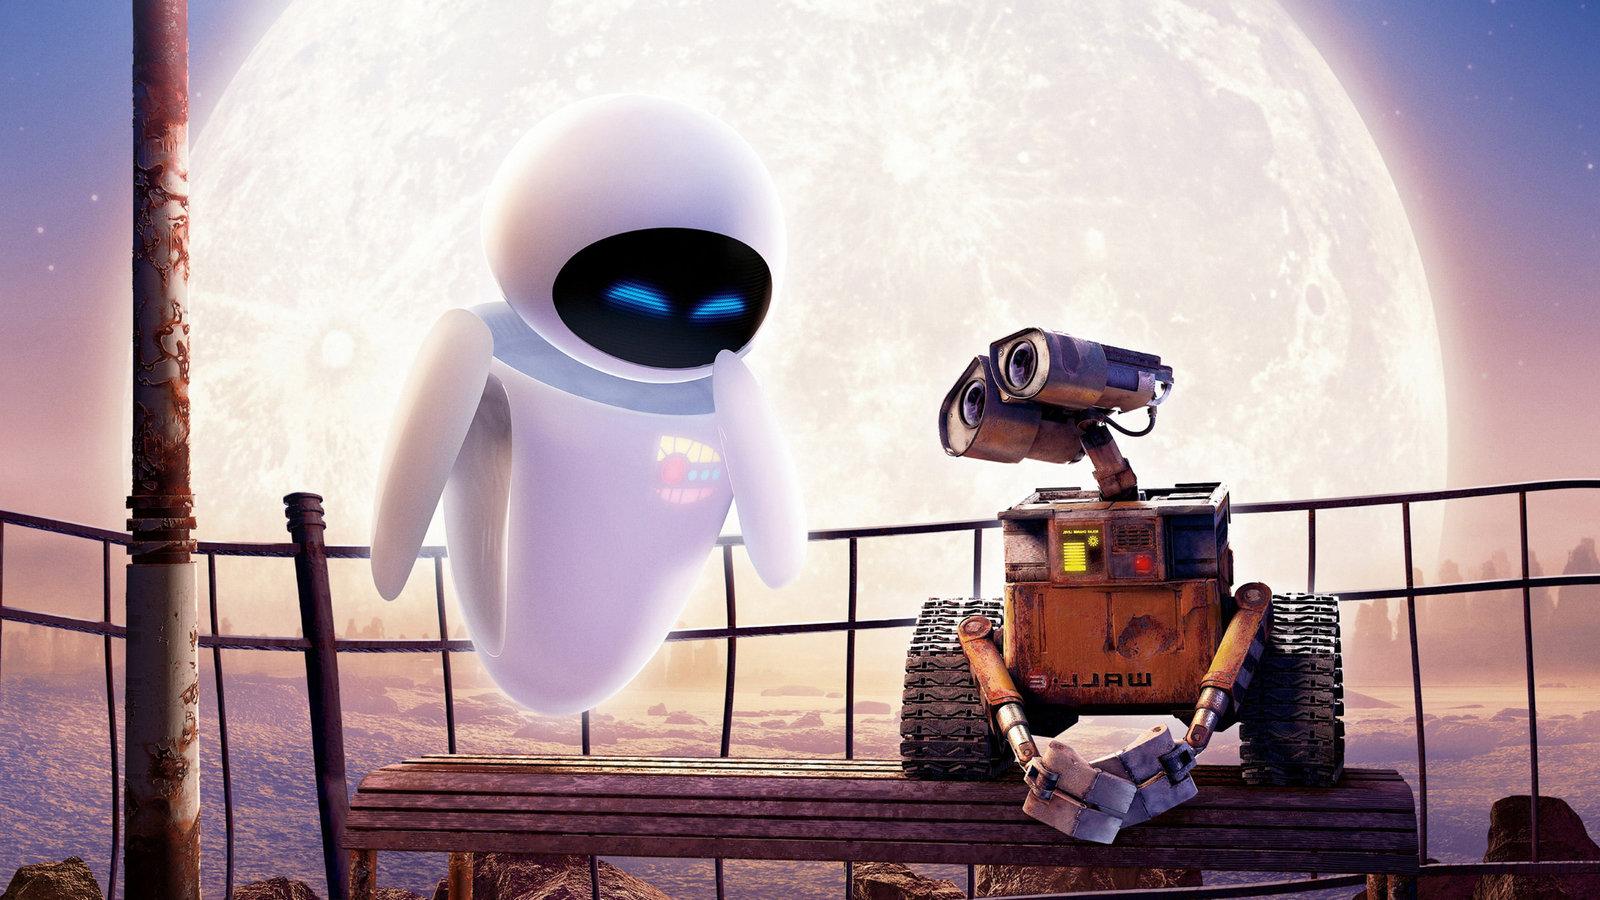 Петиция · Please, Pixar! WALL·E 2! WALL·E SEQUEL! · Change.org